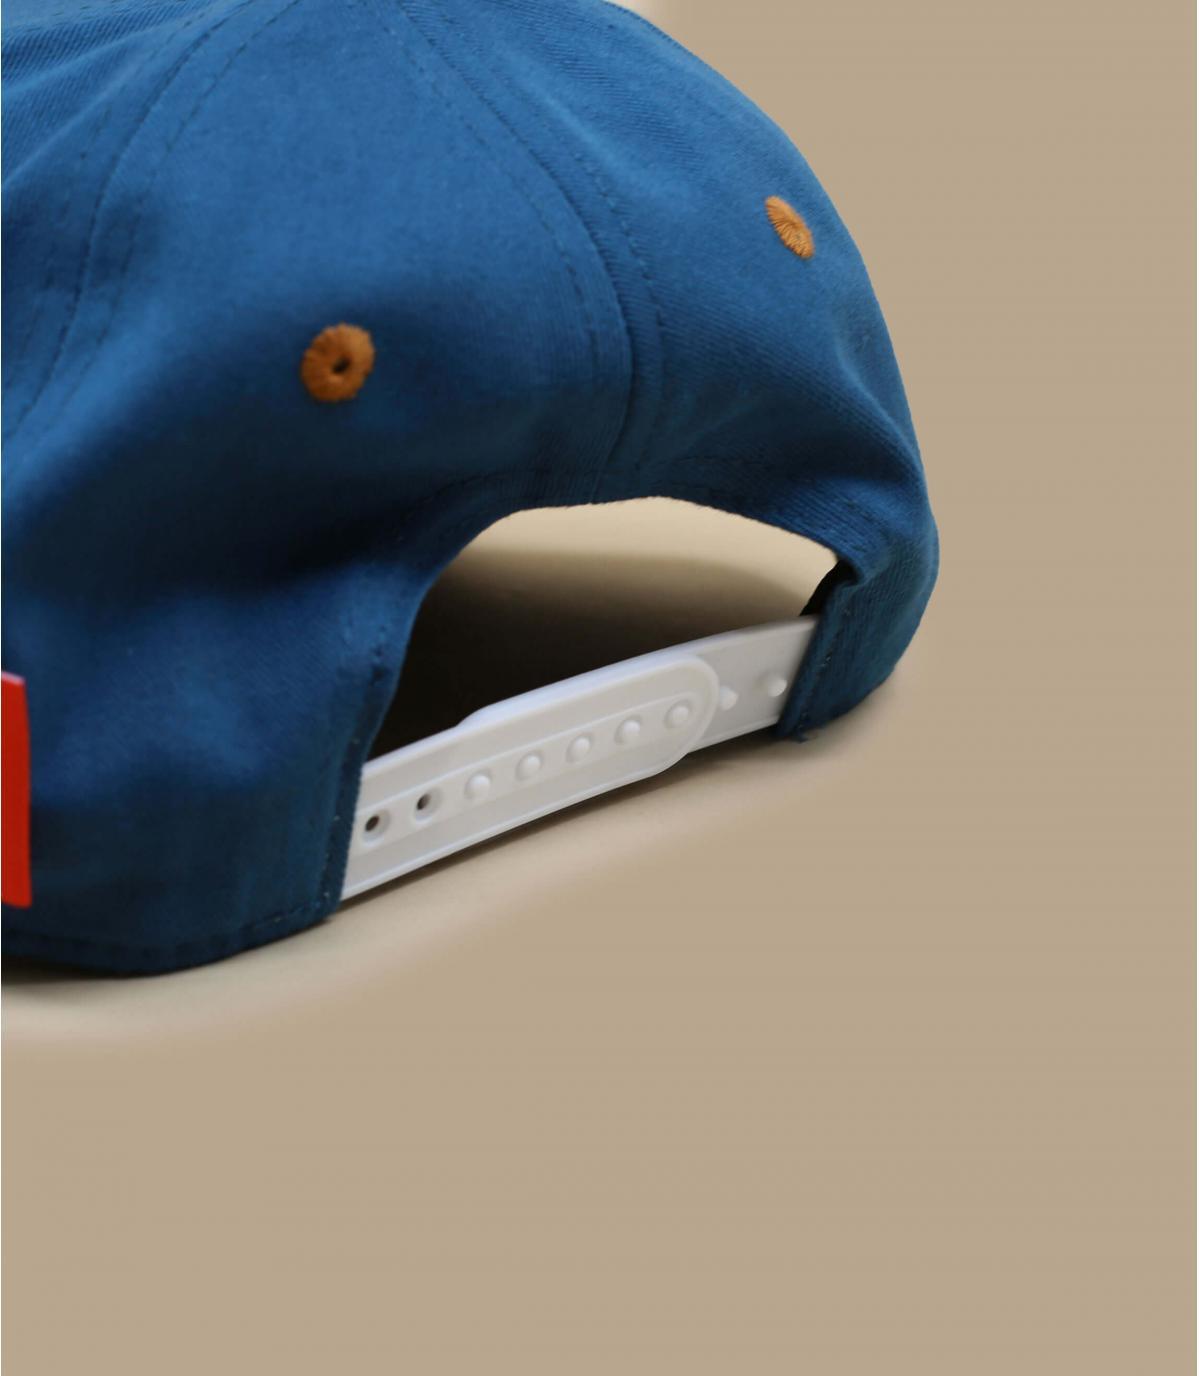 Details Curve Mini Duck blue - Abbildung 3